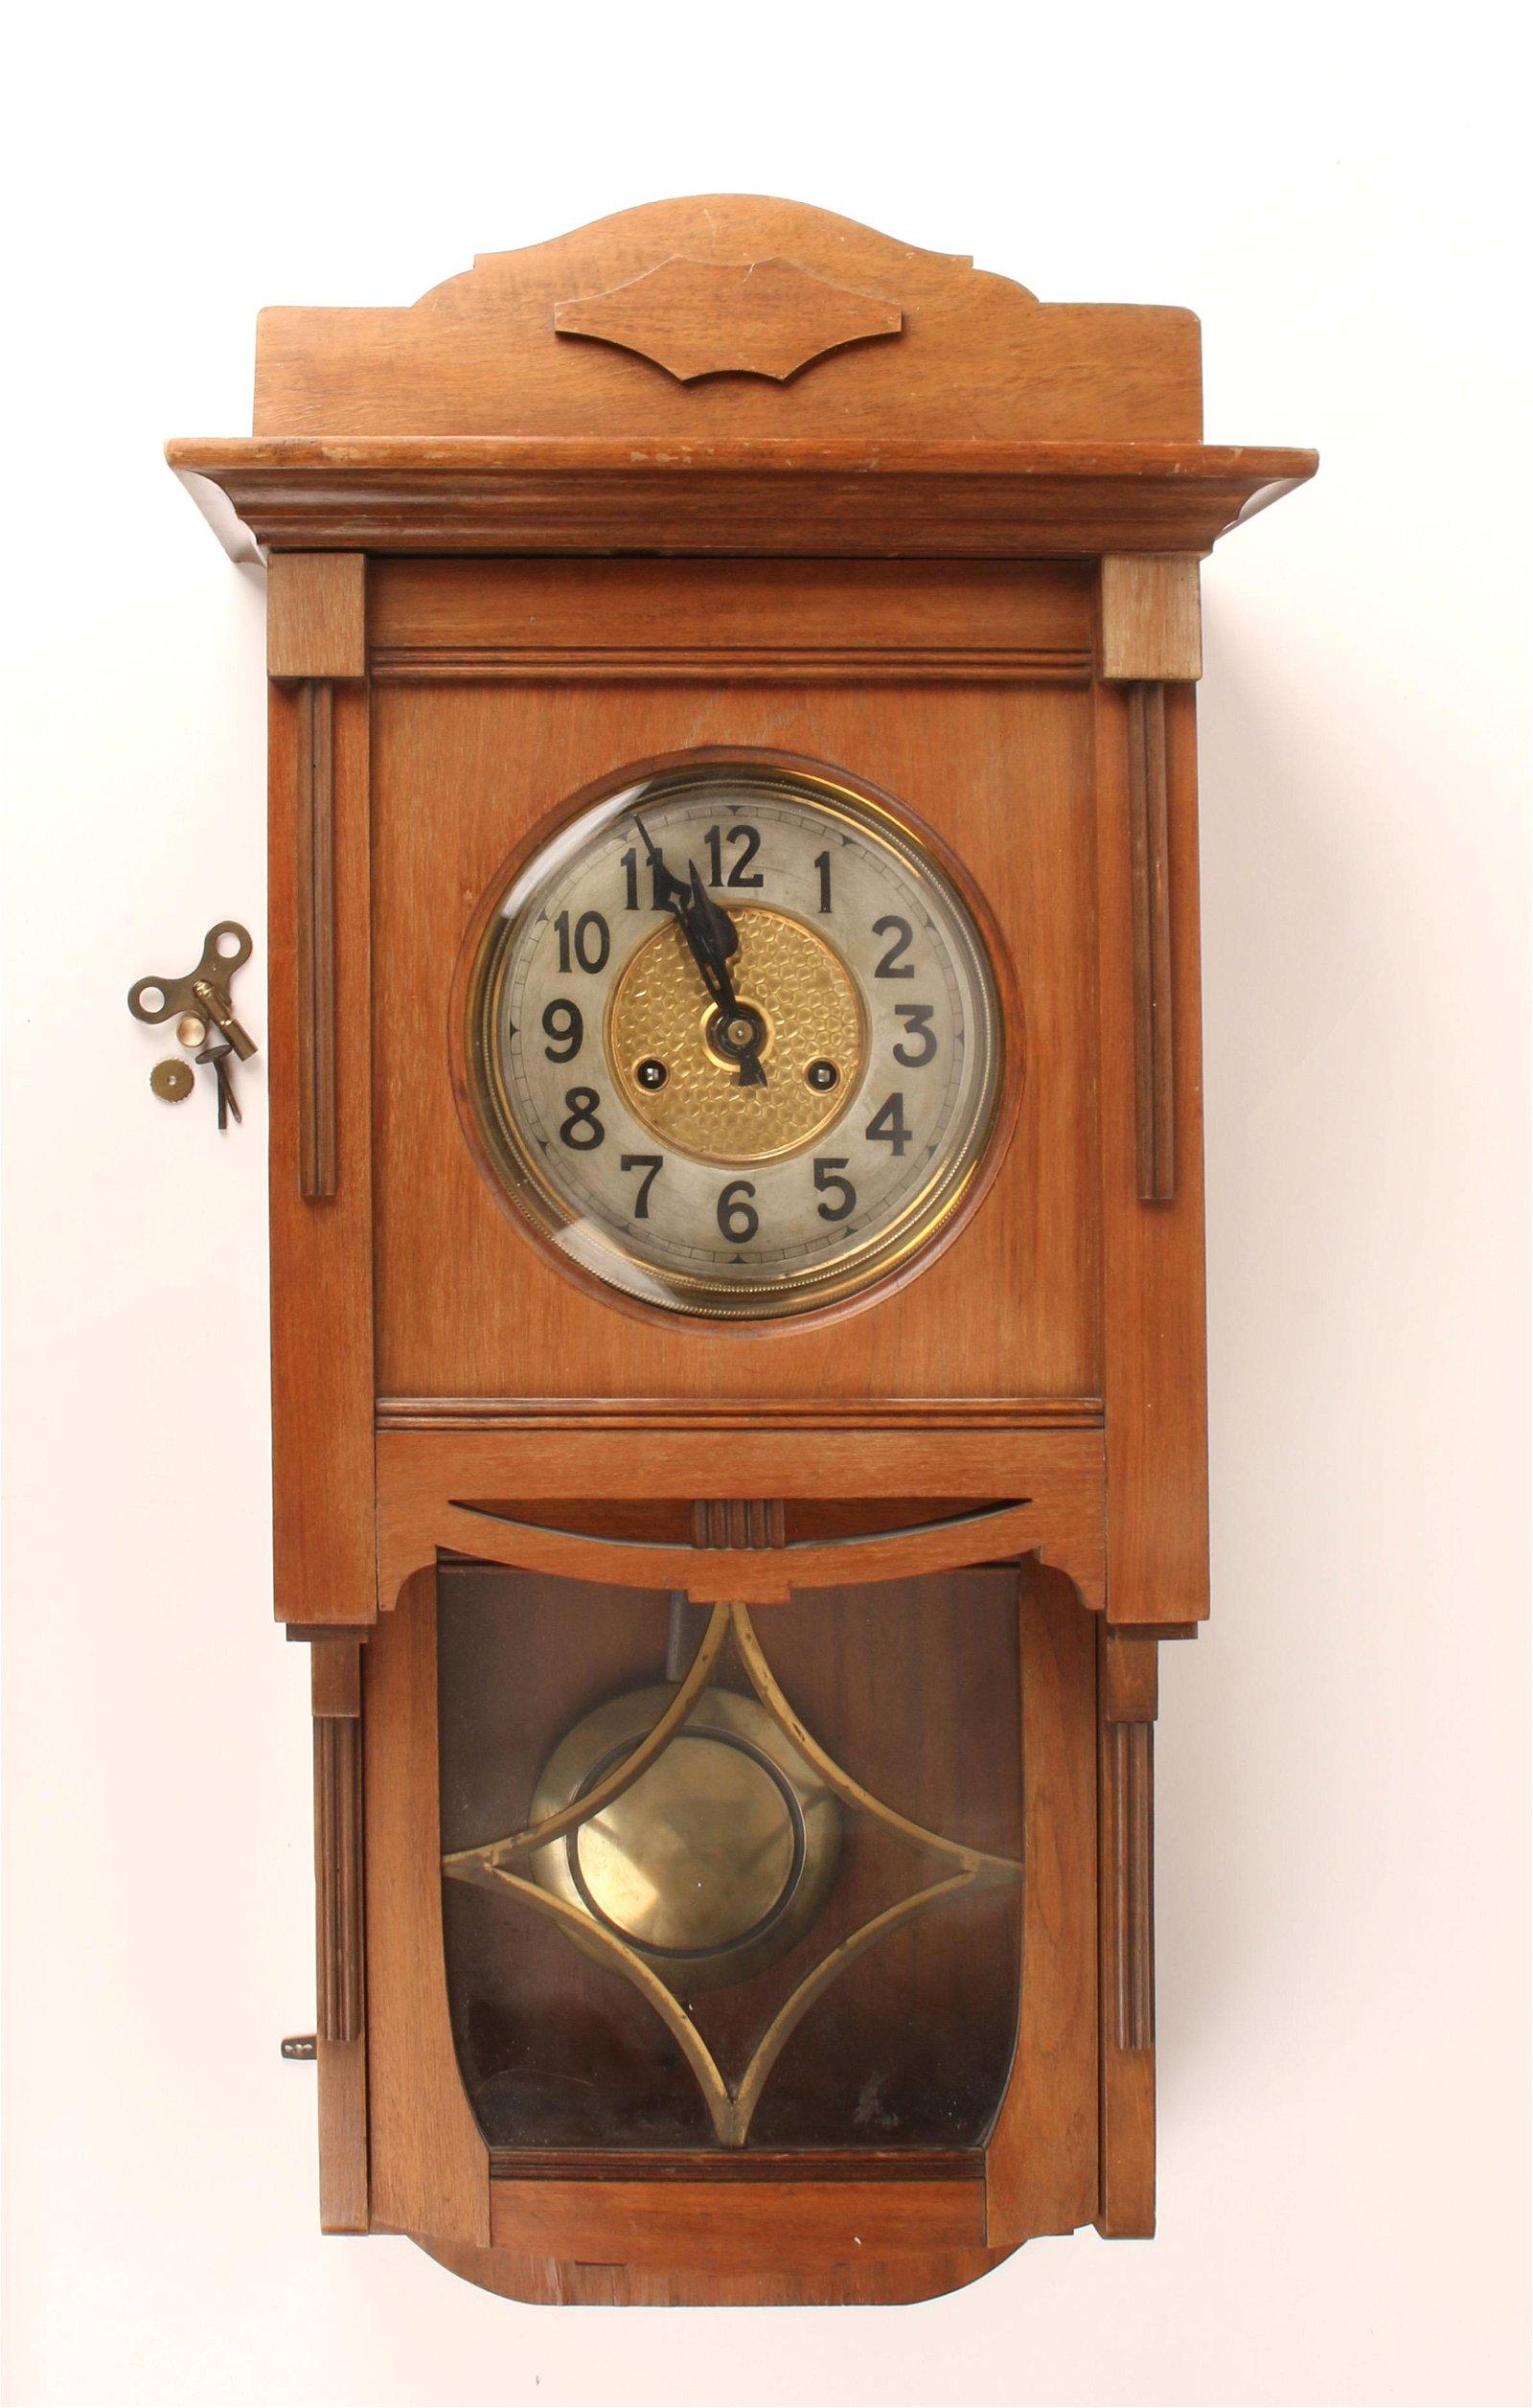 ANTIQUE GERMAN GUSTAV BECKER SILESIA WALL CLOCK